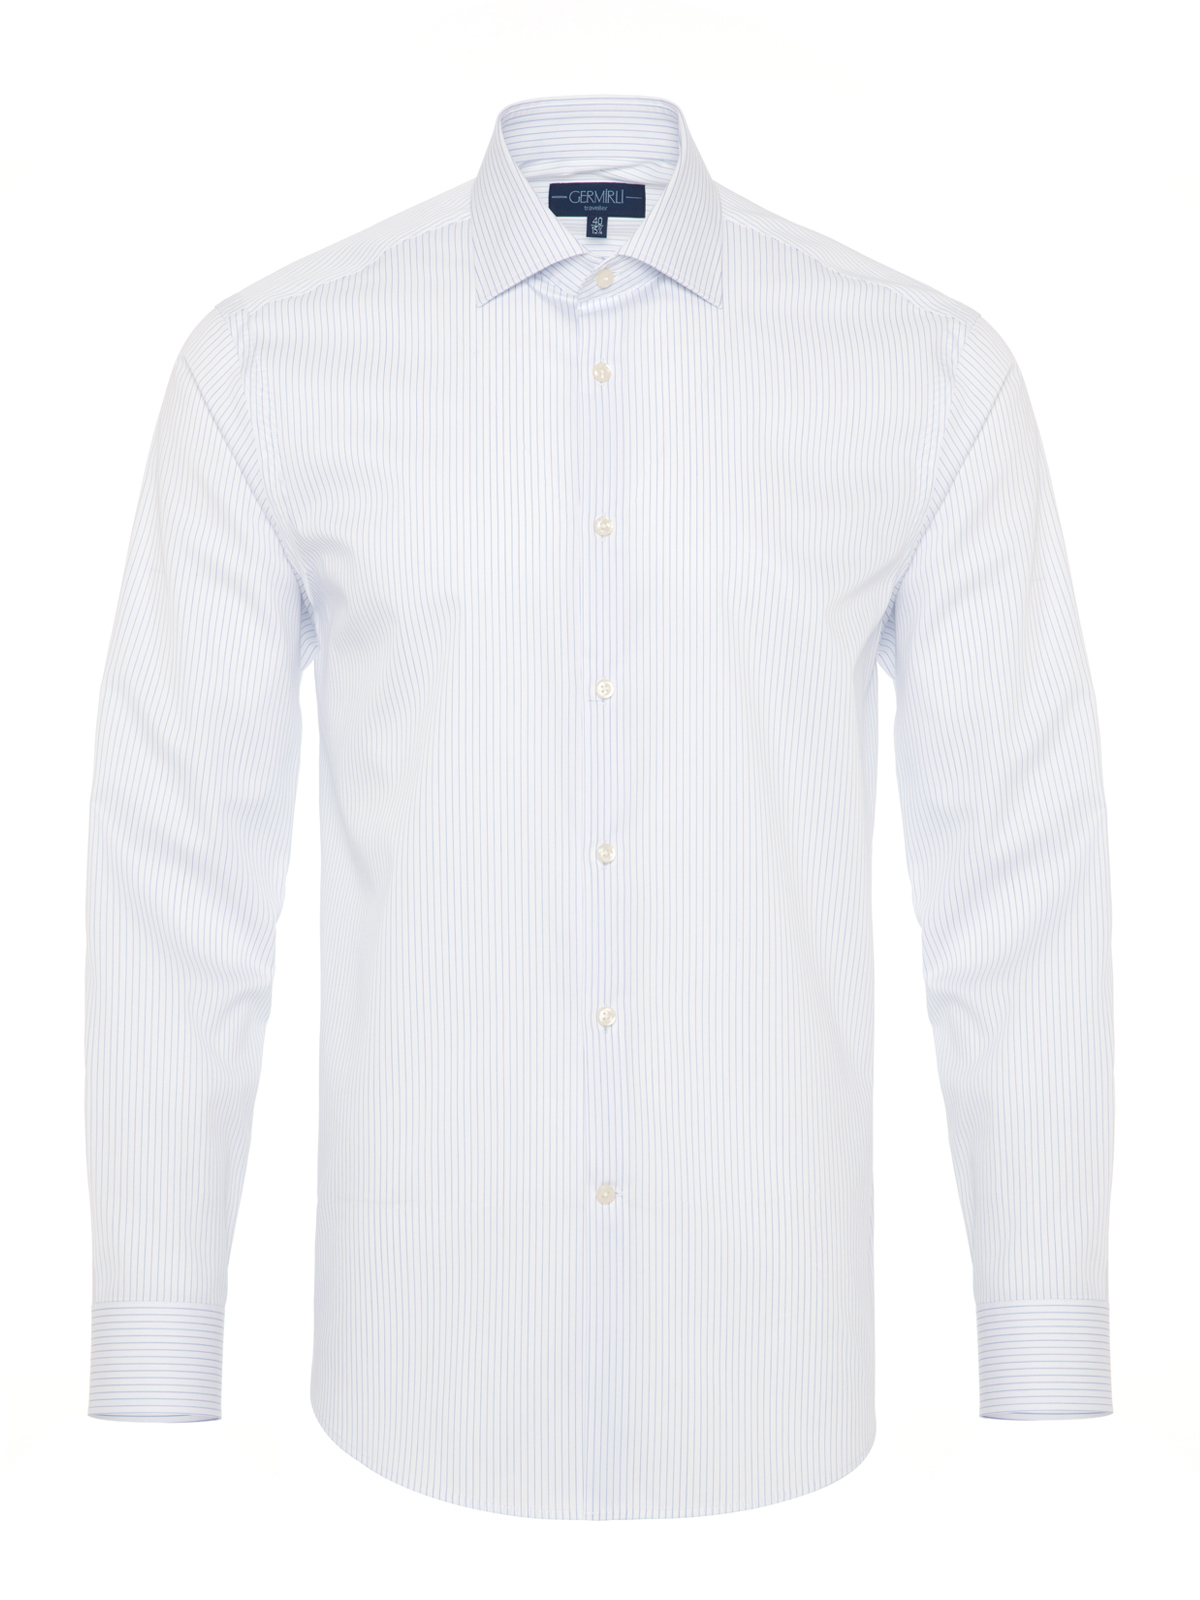 Germirli - Germirli Non Iron Navy Stripe Semi Spread Tailor Fit Shirt